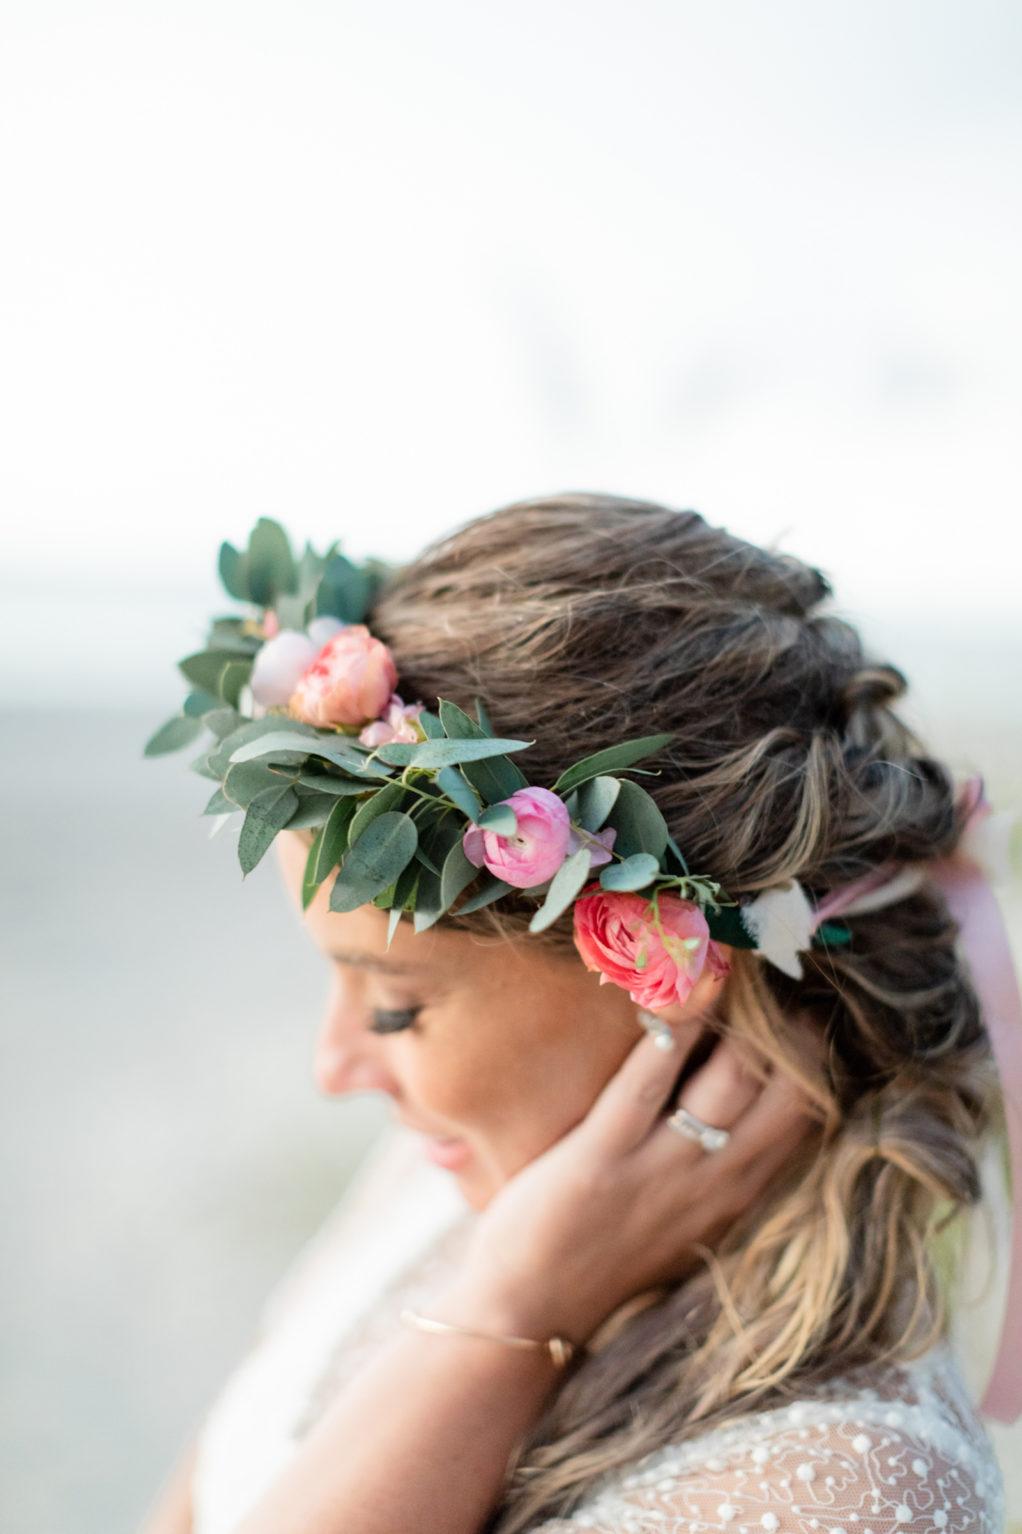 Pastel Peach Boho Beach Wedding Hair Inspiration with Bridal Floral Halo of Ranunculus and Eucalyptus Greenery | Michele Renee the Studio